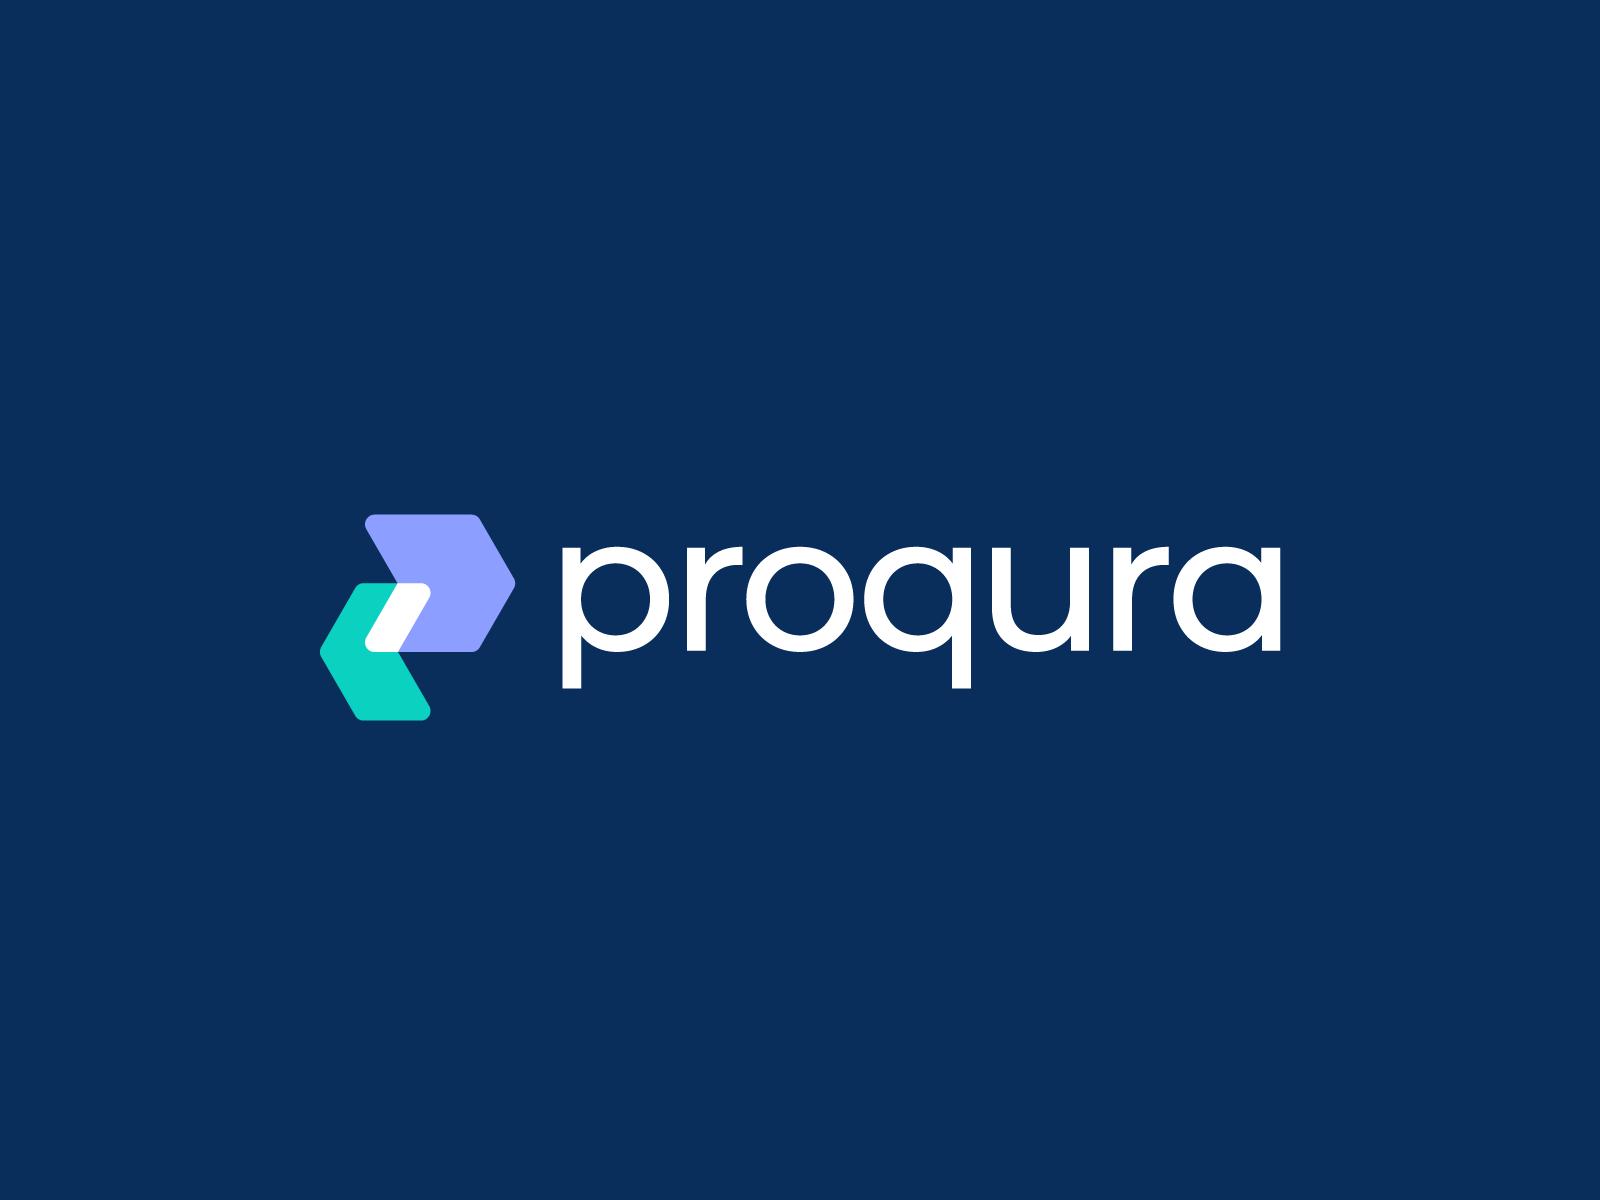 Proqura – Logo Design